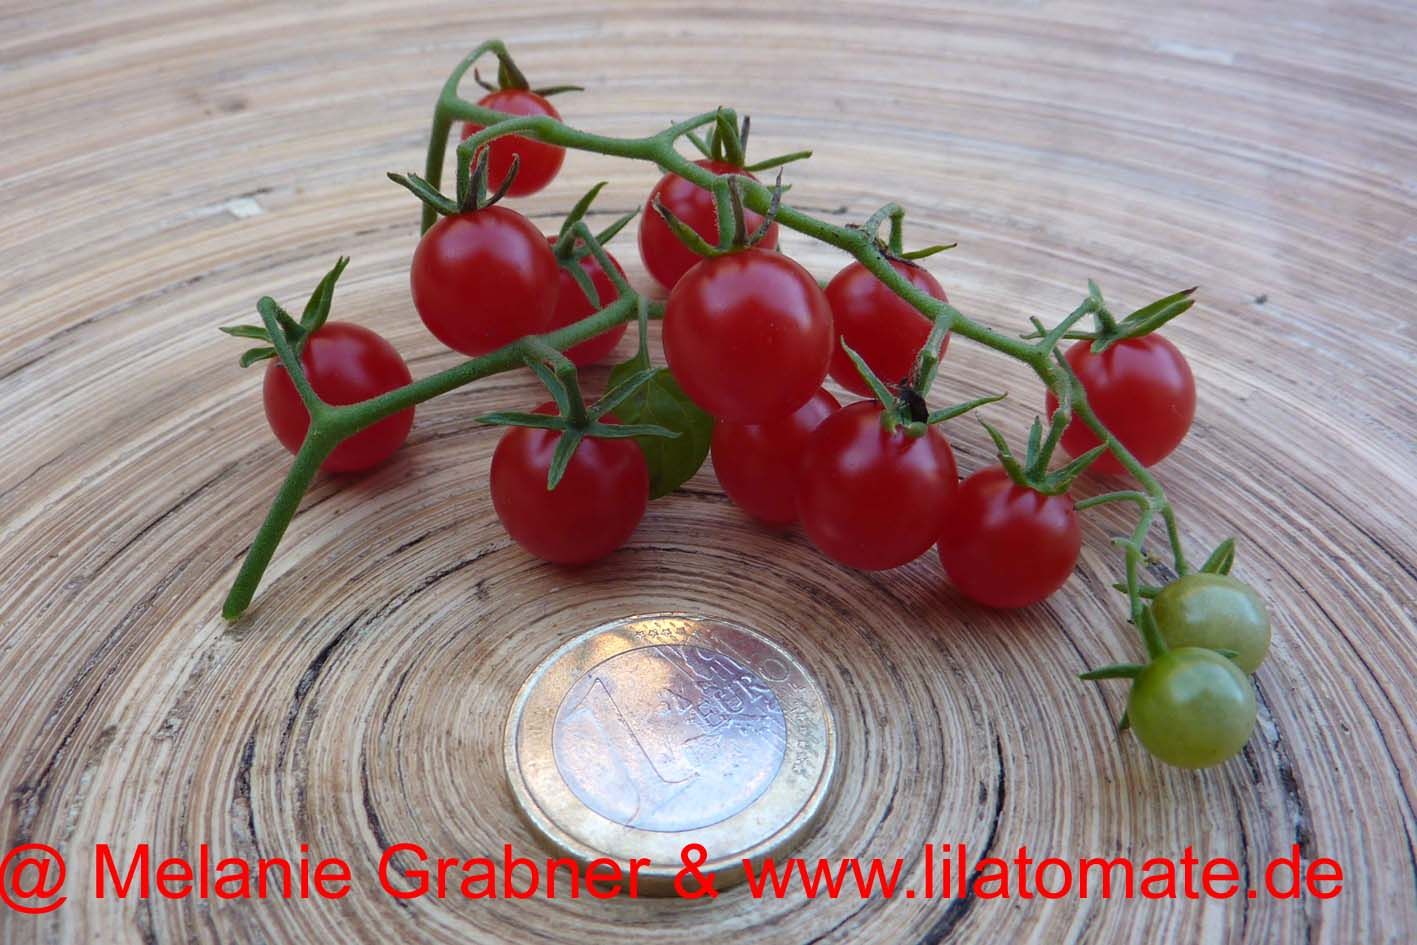 Tomate 'Argentinische Wildtomate' Saatgut